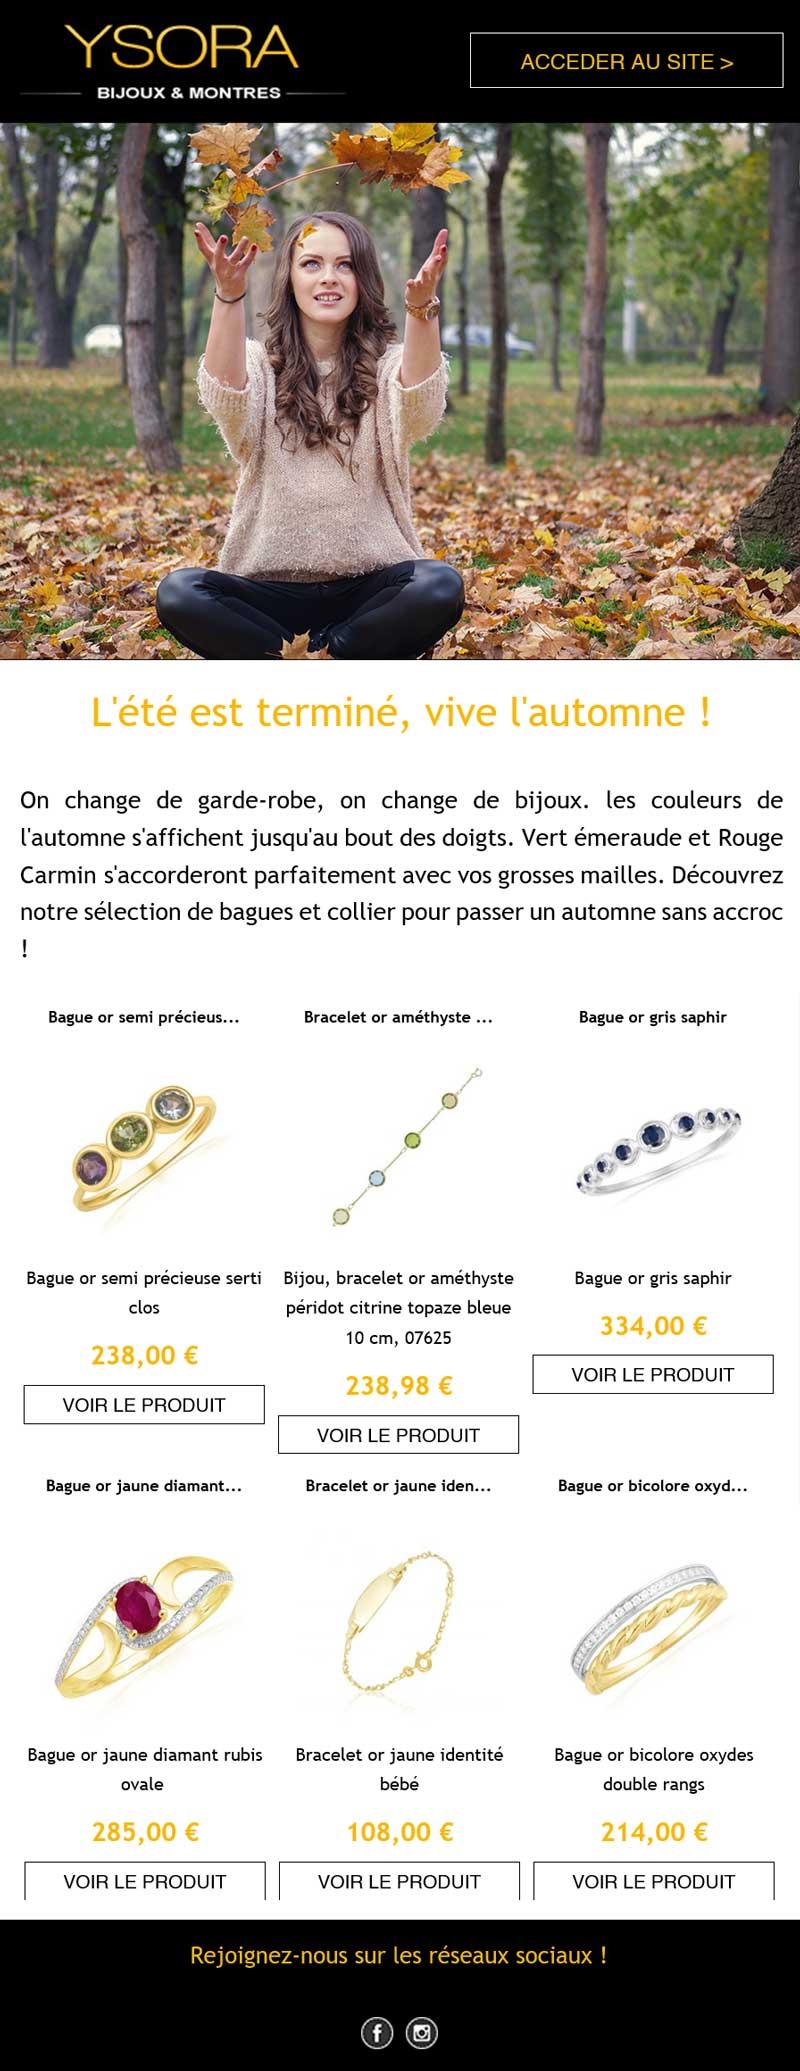 Newsletter Ysora - octobre 2019